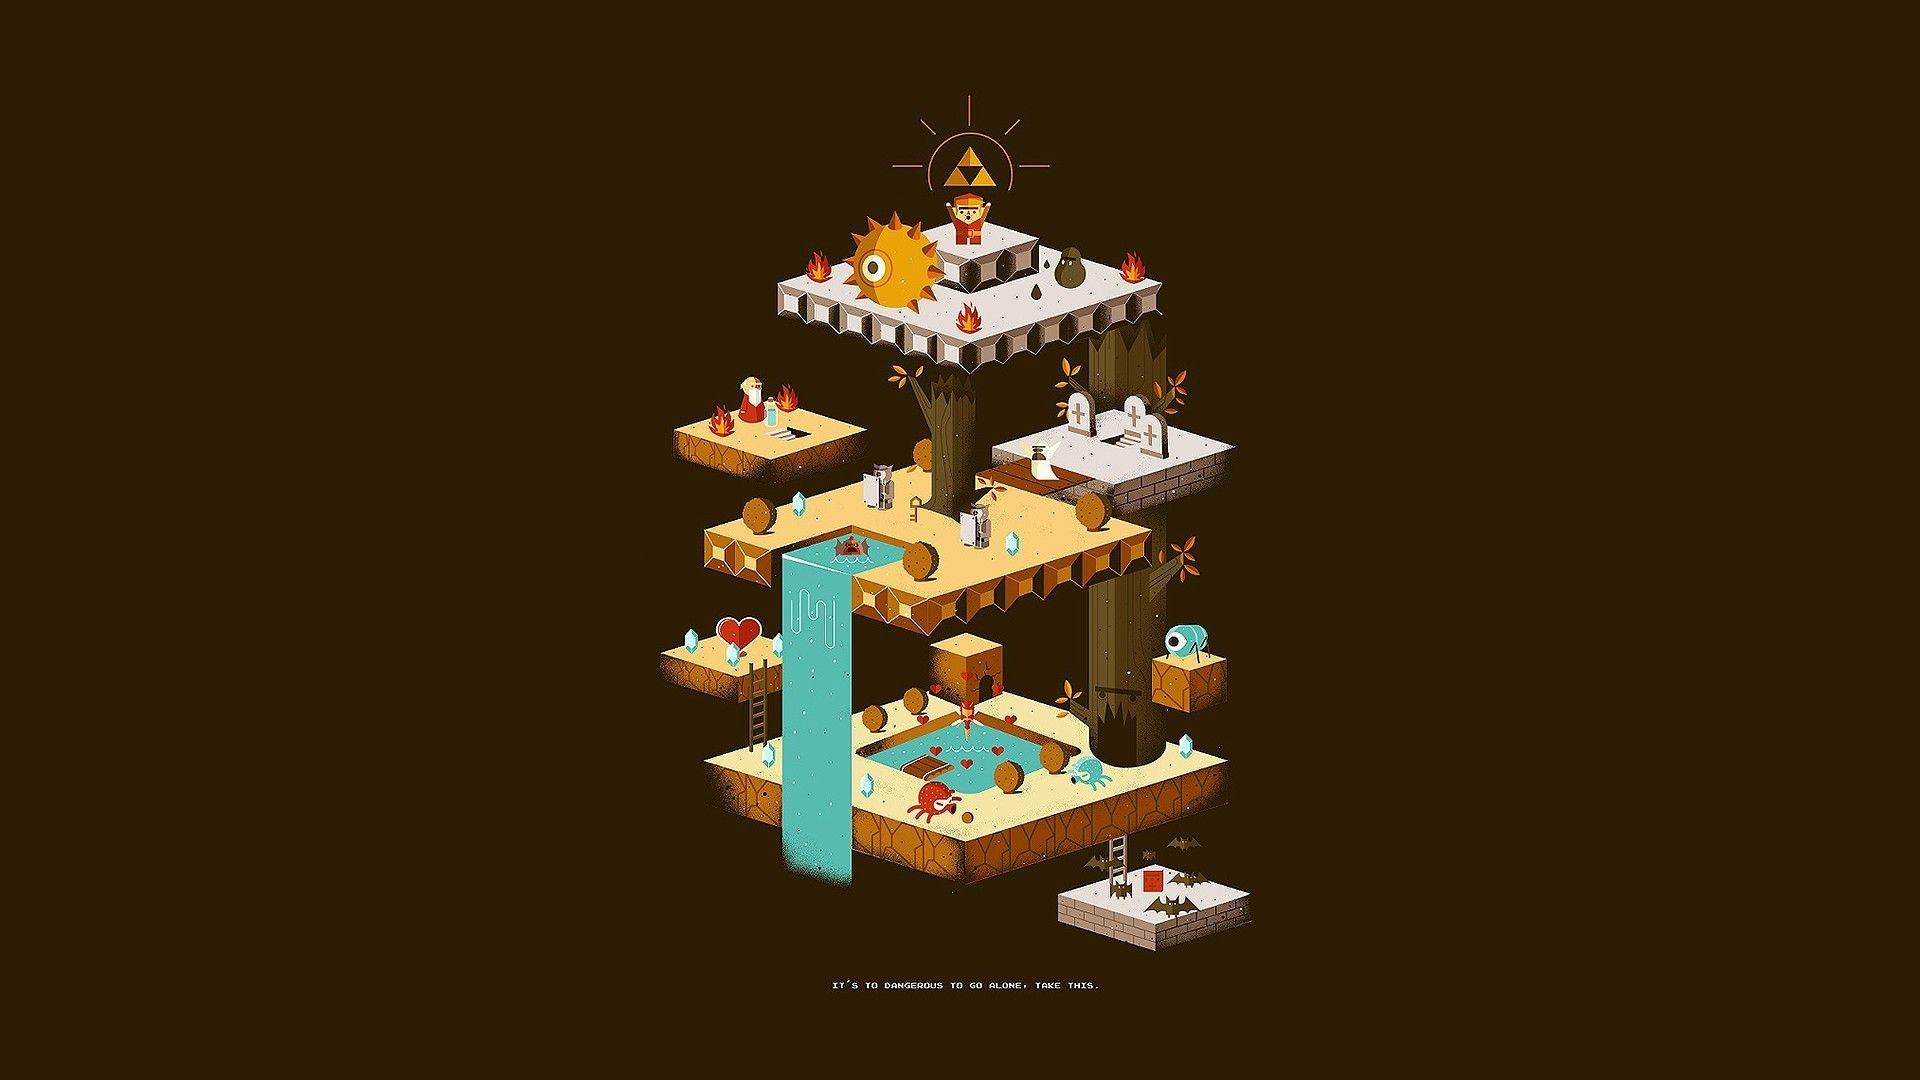 The Legend of Zelda Wallpaper HD | Wallpapers, Backgrounds, Images .